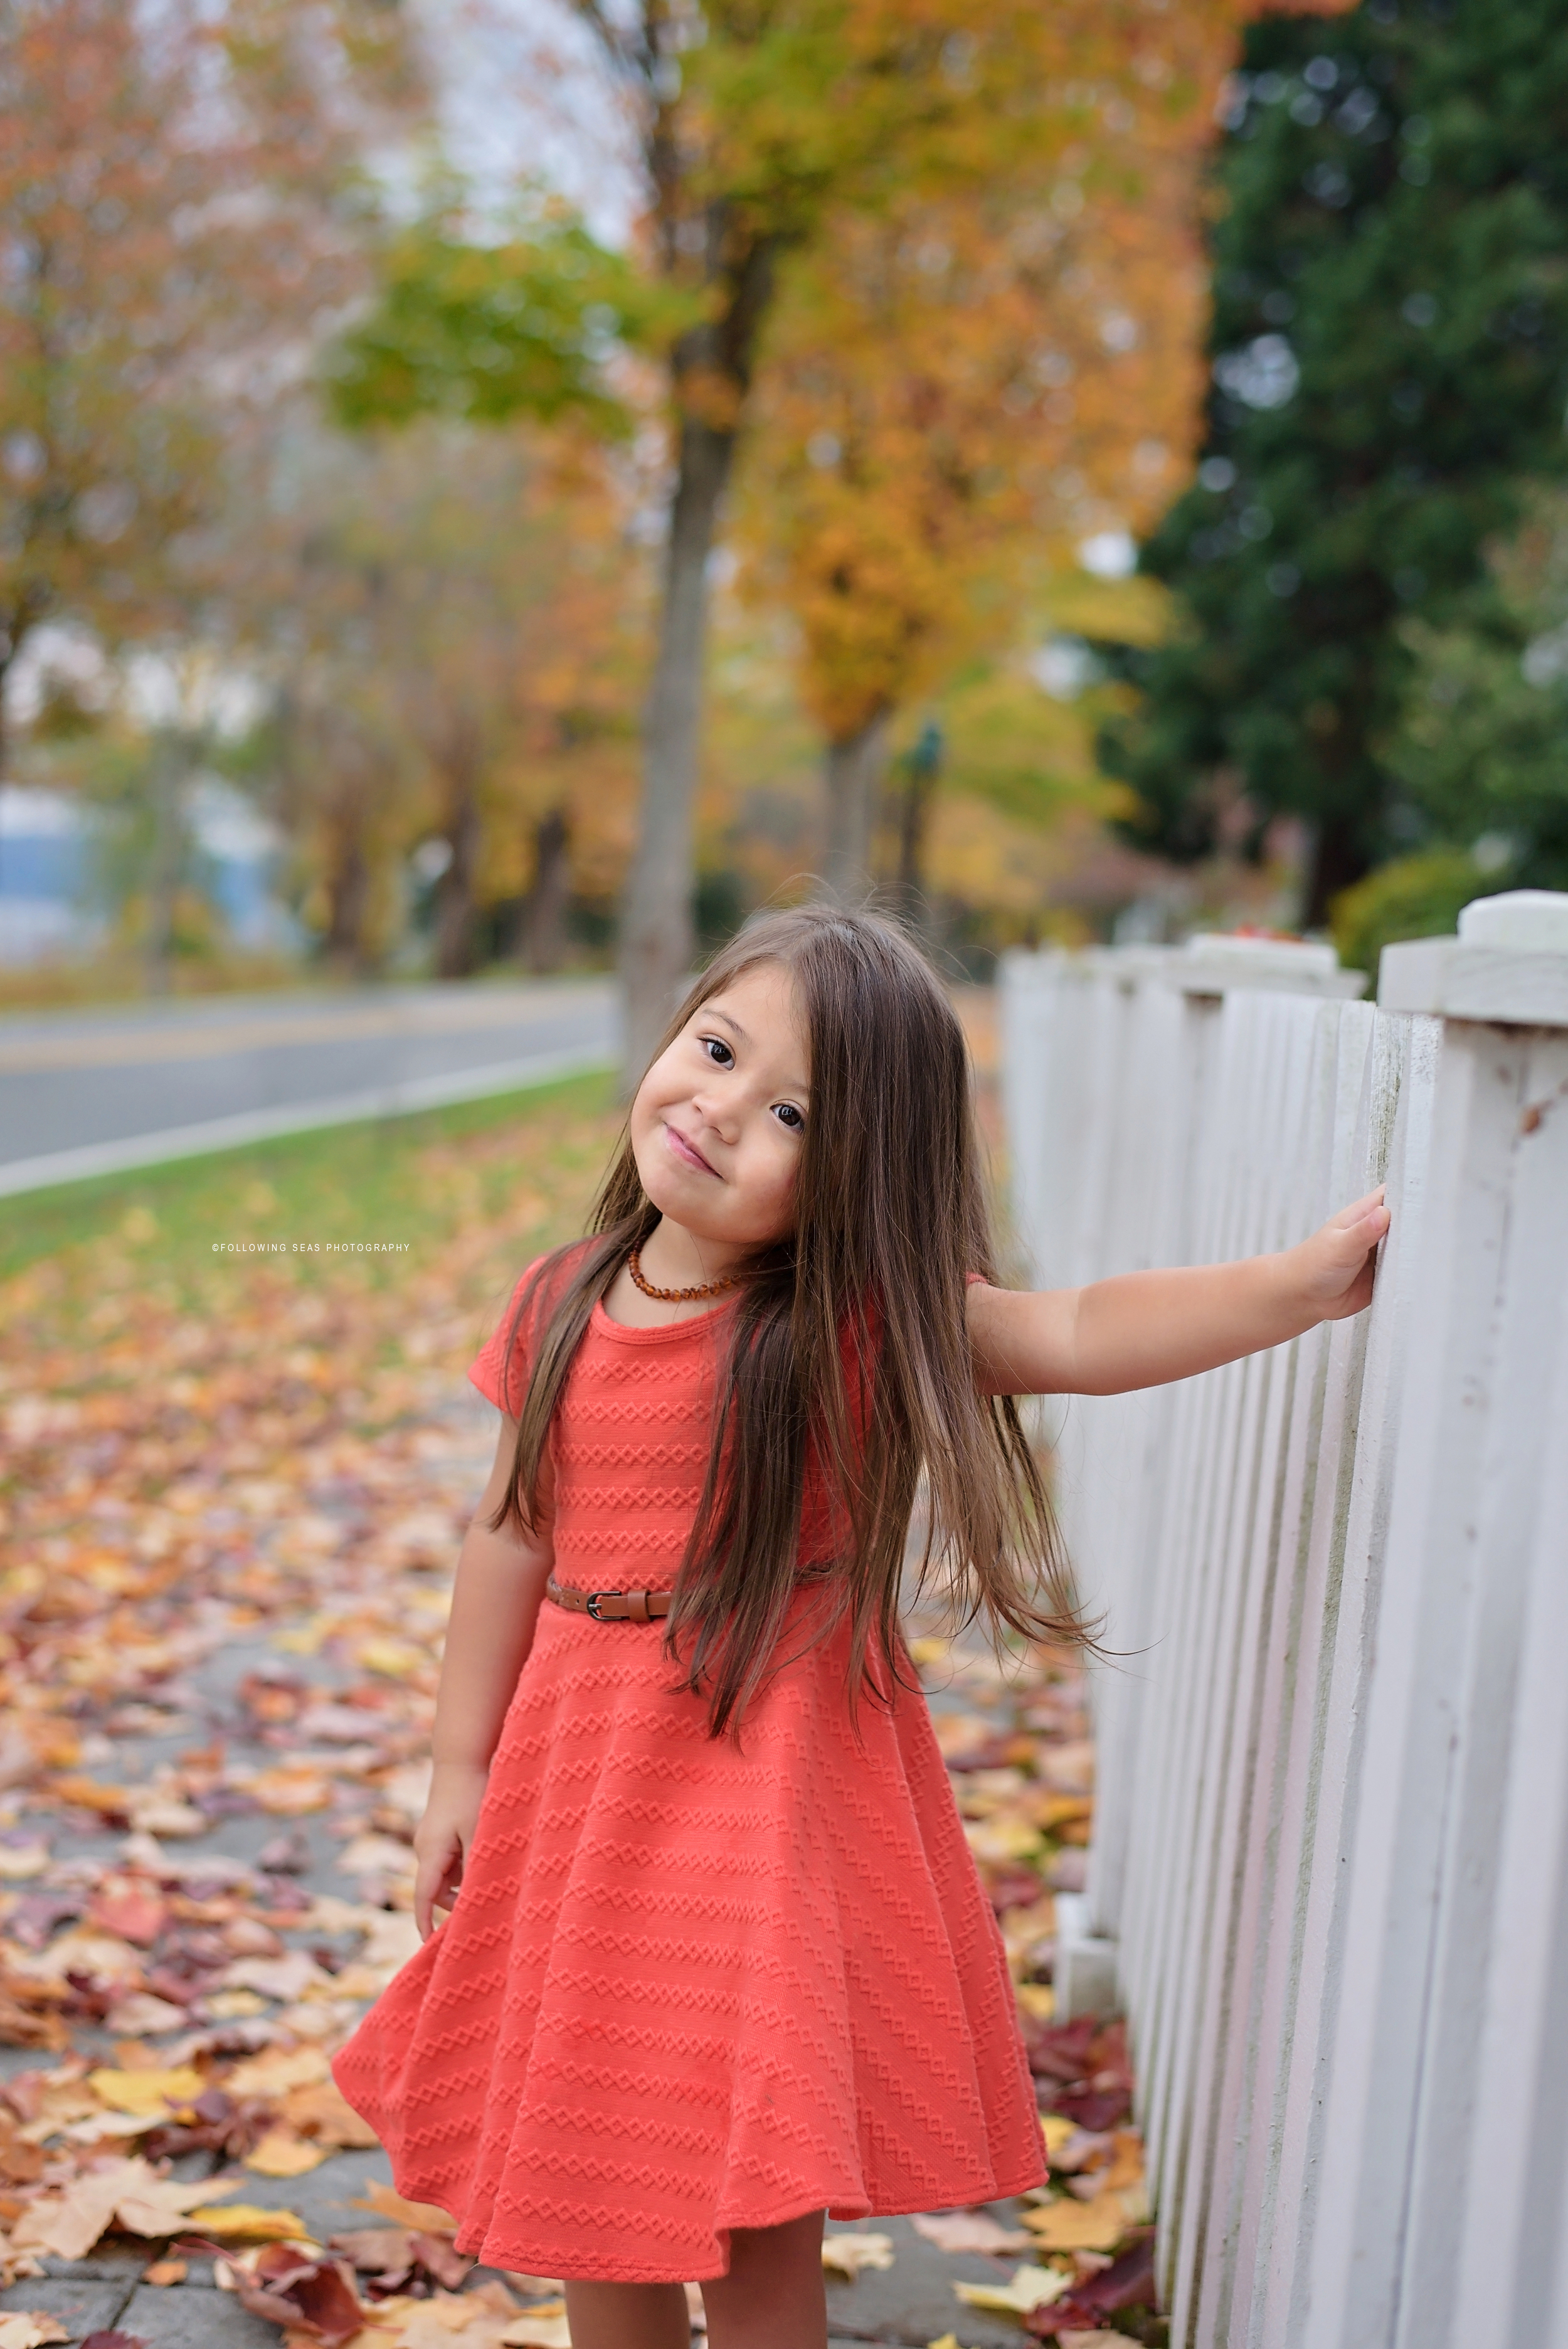 Bremerton-Family-Photographer-Following-Seas-Photography-26 copy.jpg